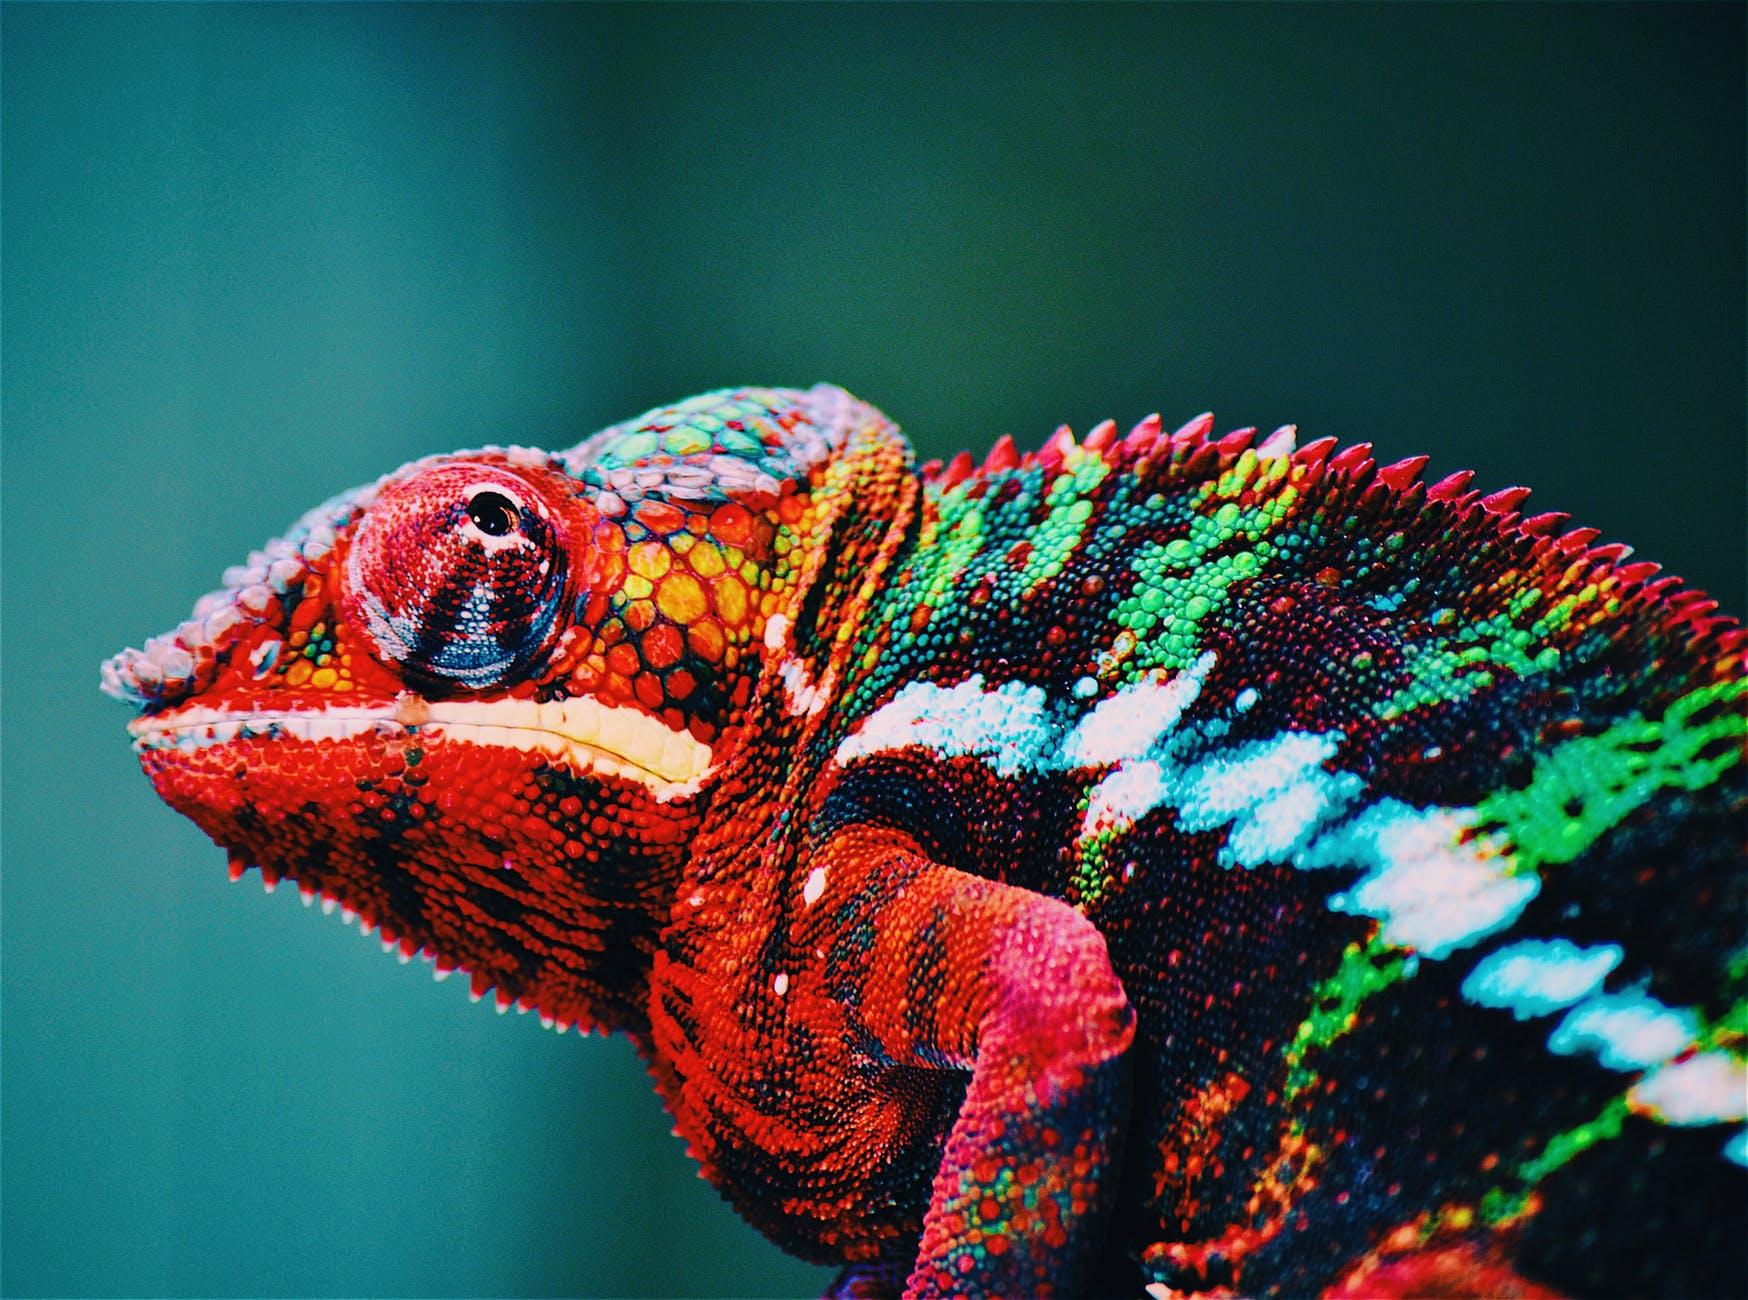 chameleon misconceptions true